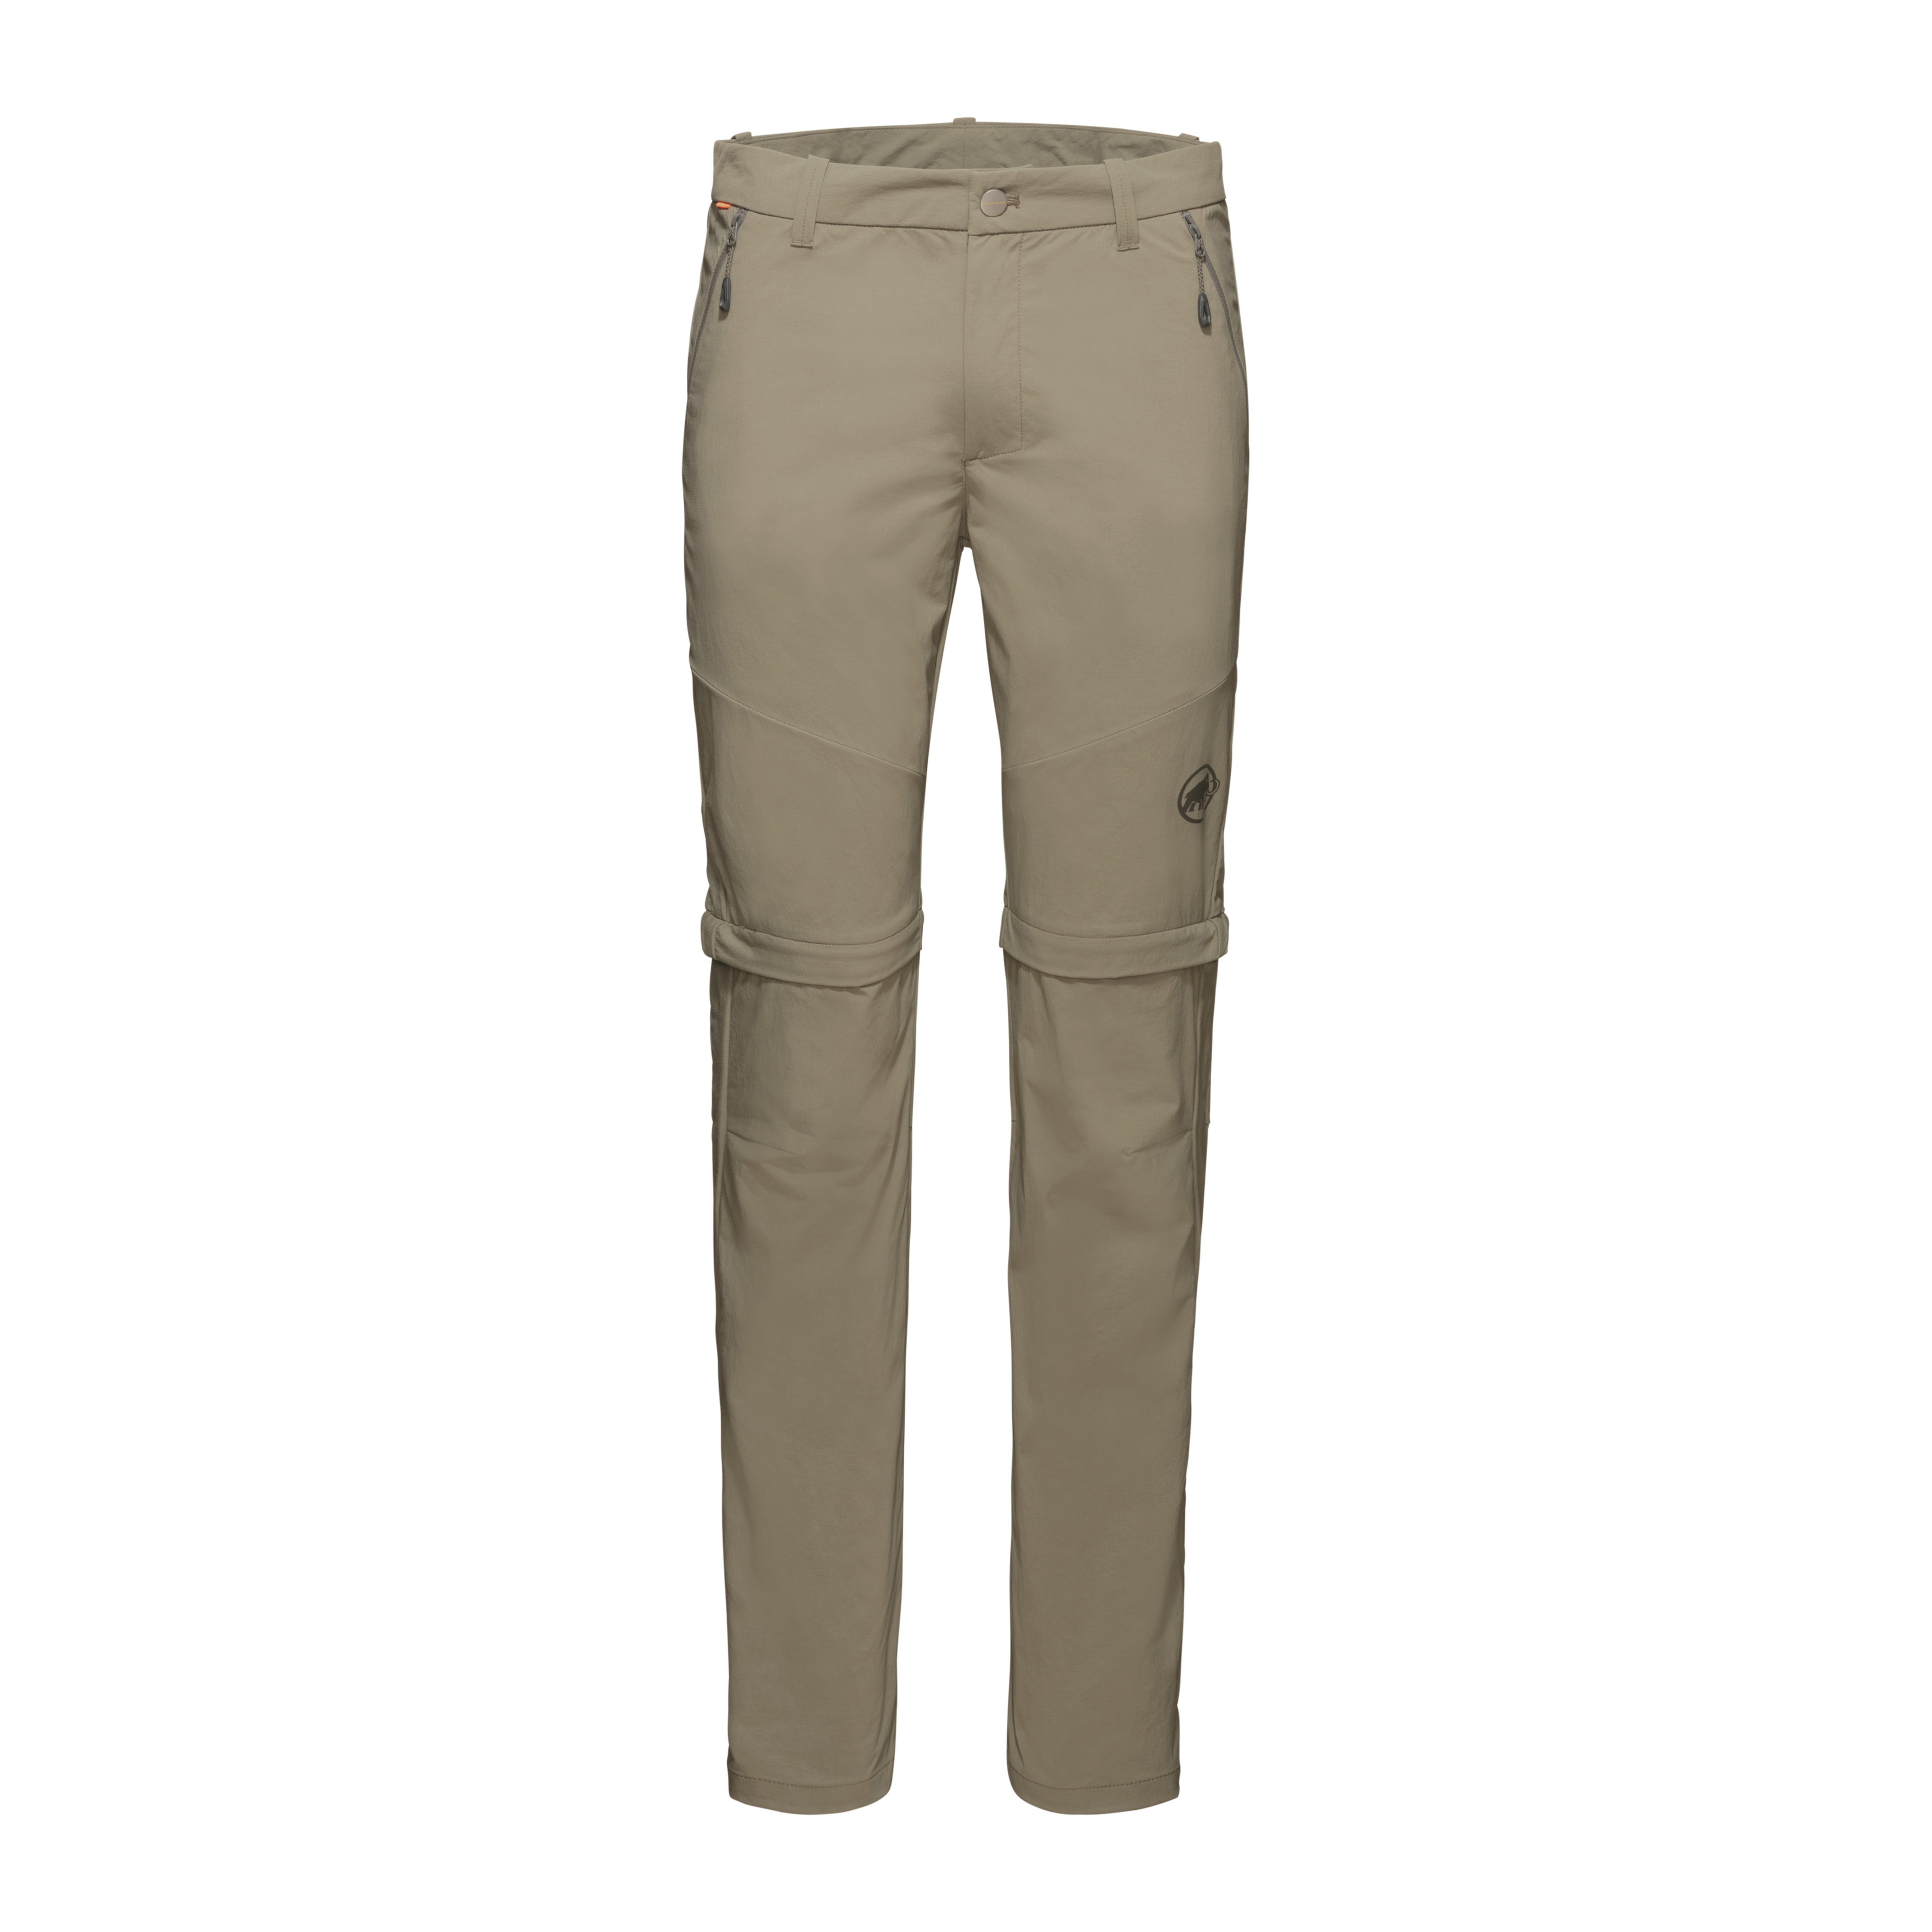 Hiking Zip Off Pants Men - normal, tin, UK 28 thumbnail